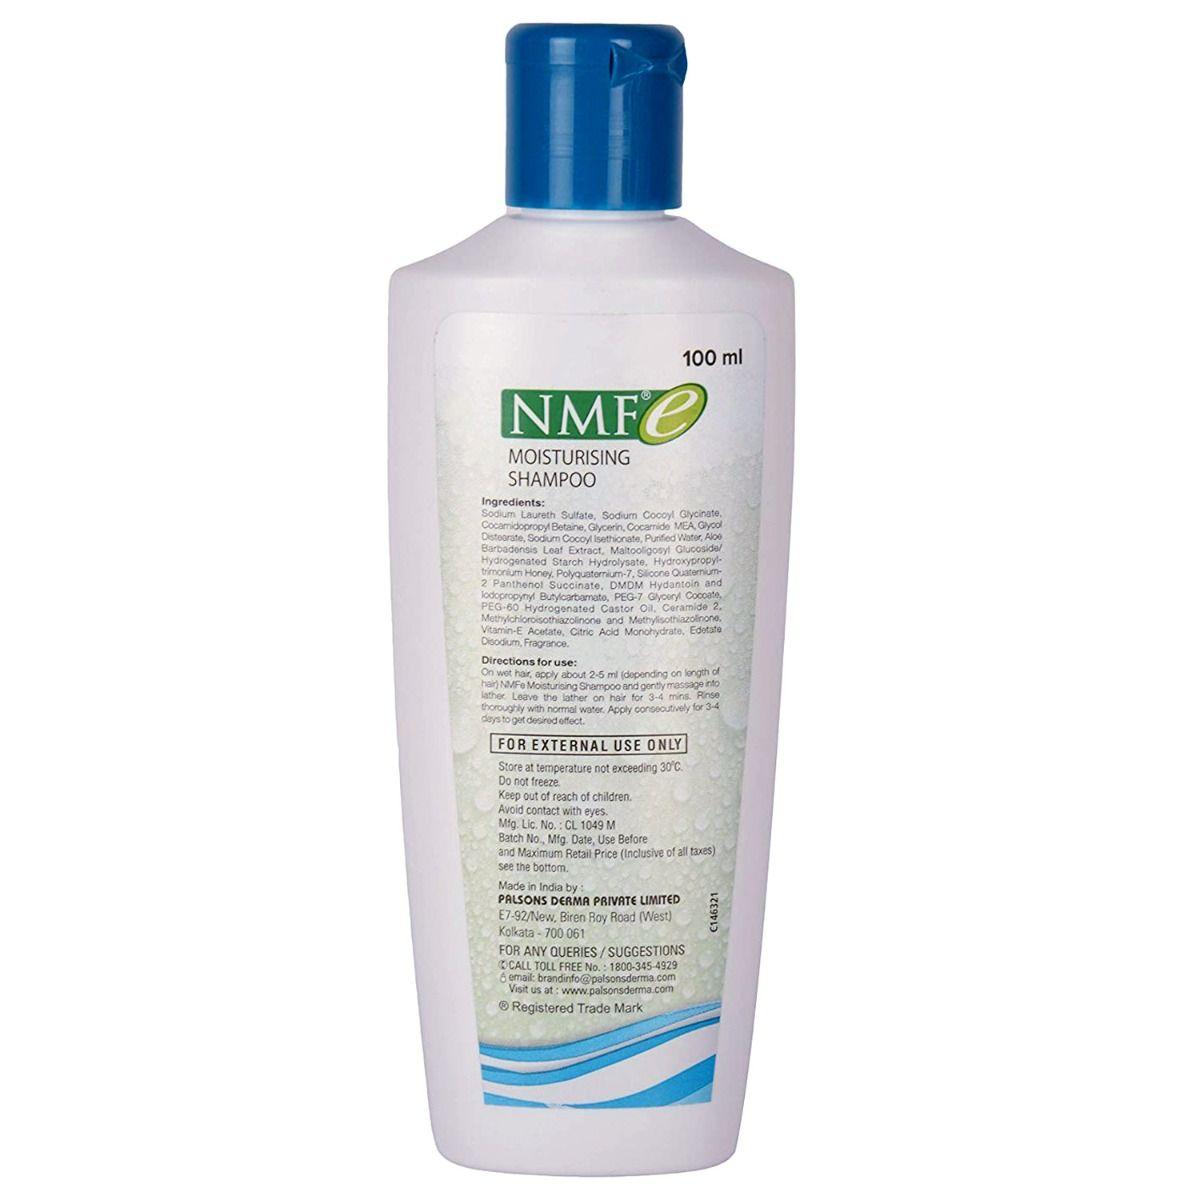 Nmfe Moisturising Shampoo, 100 ml, Pack of 1